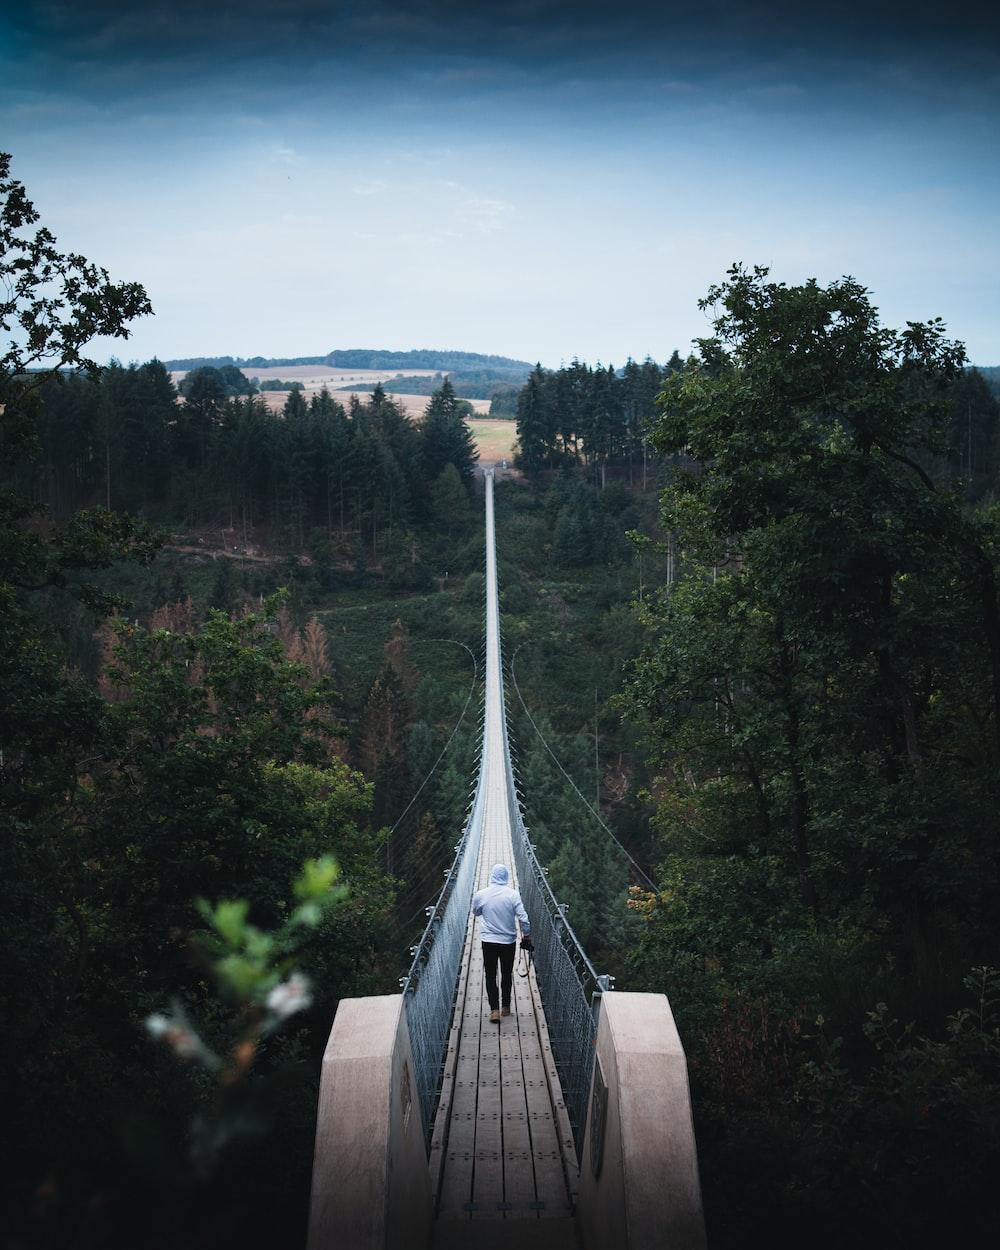 gray concrete bridge in between green trees during daytime